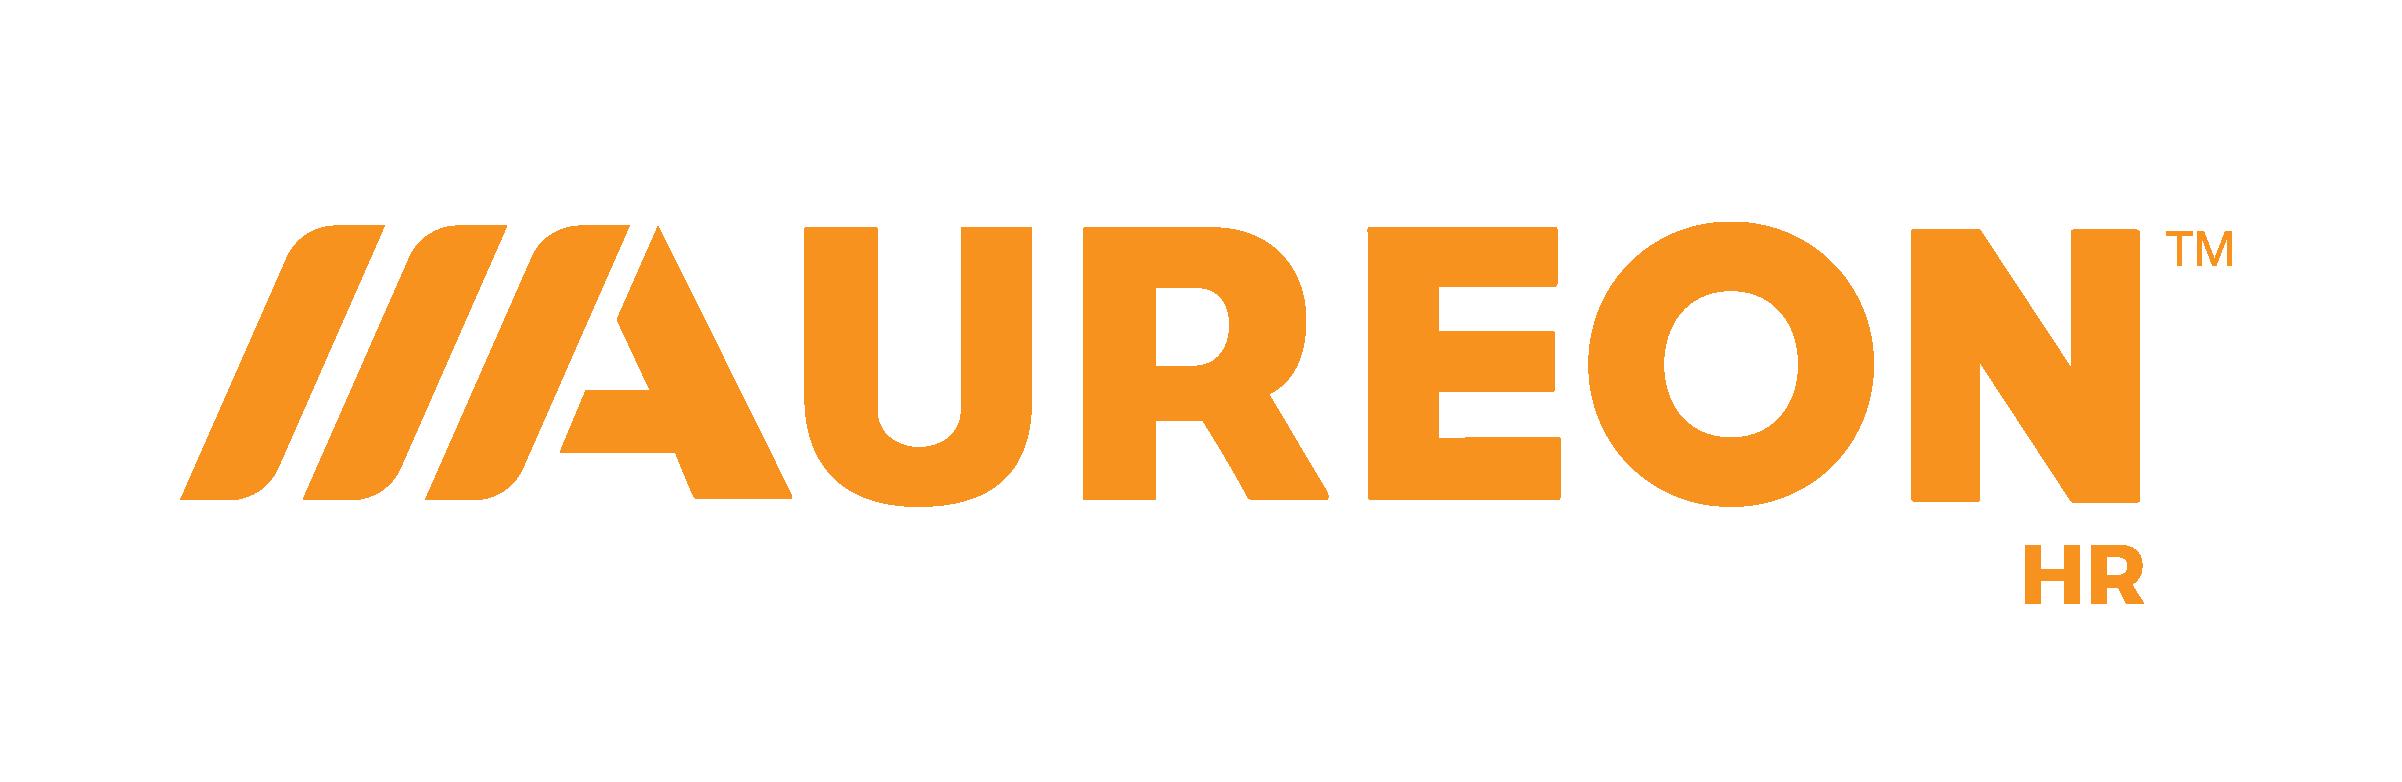 Aureon-HR---Orange.PNG